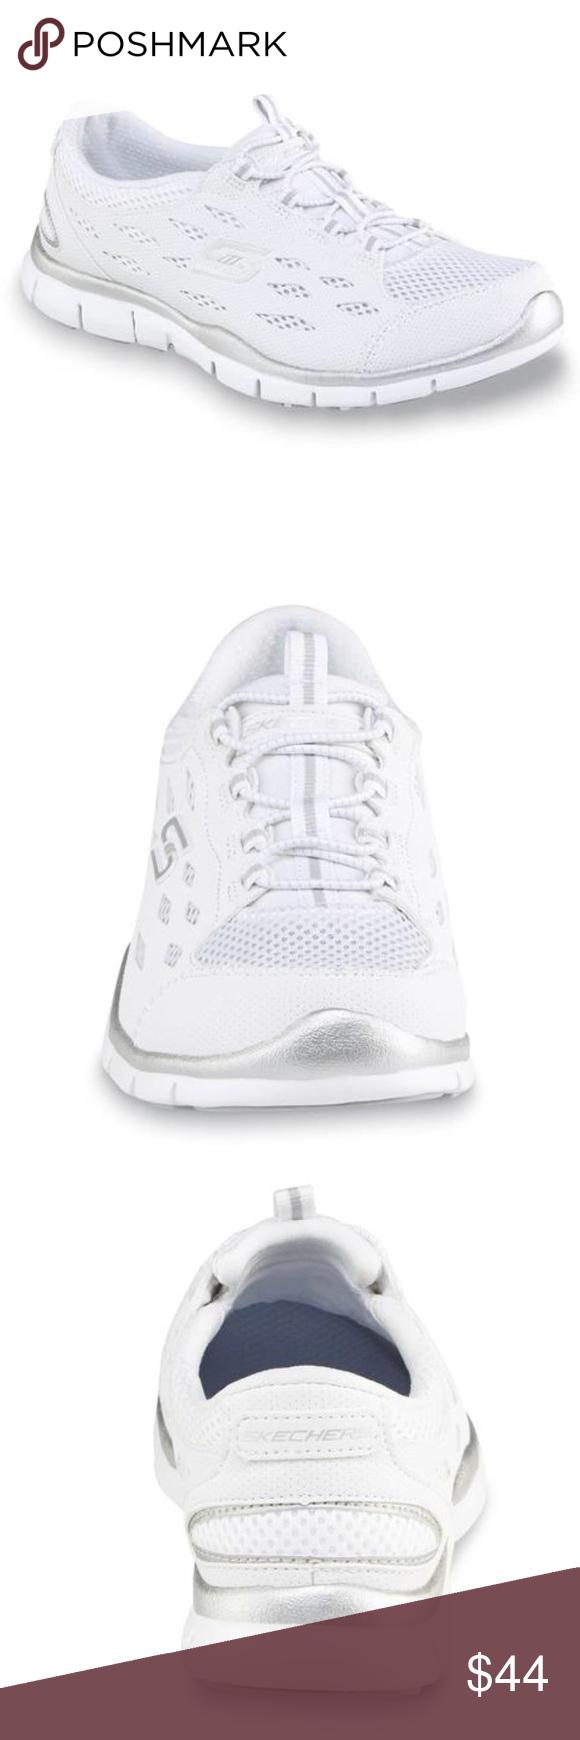 Gratis Going Places Sneaker White